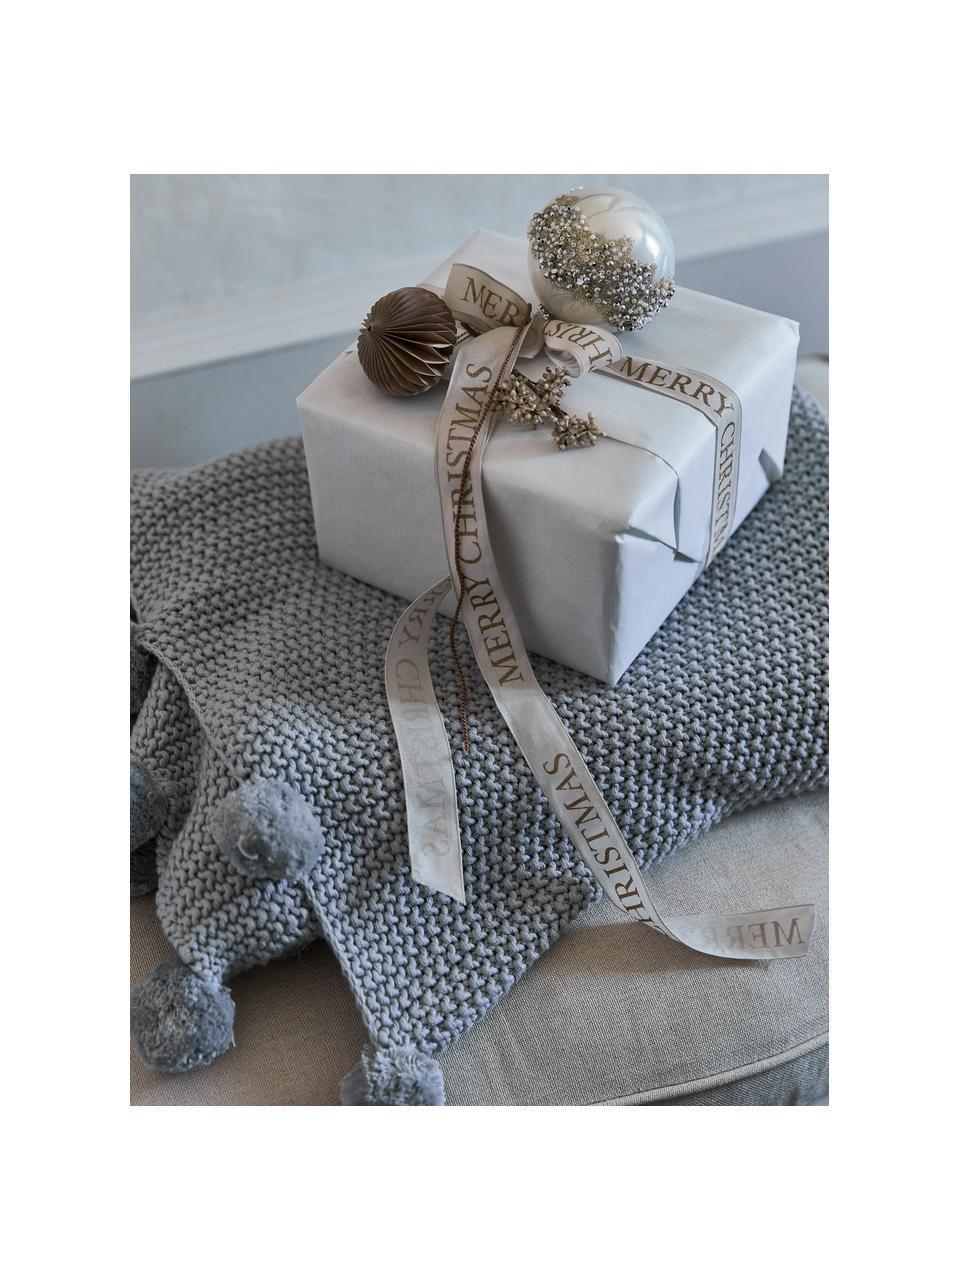 Geschenkband Textire, Polyester, Hellbraun, Goldfarben, 3 x 1500 cm